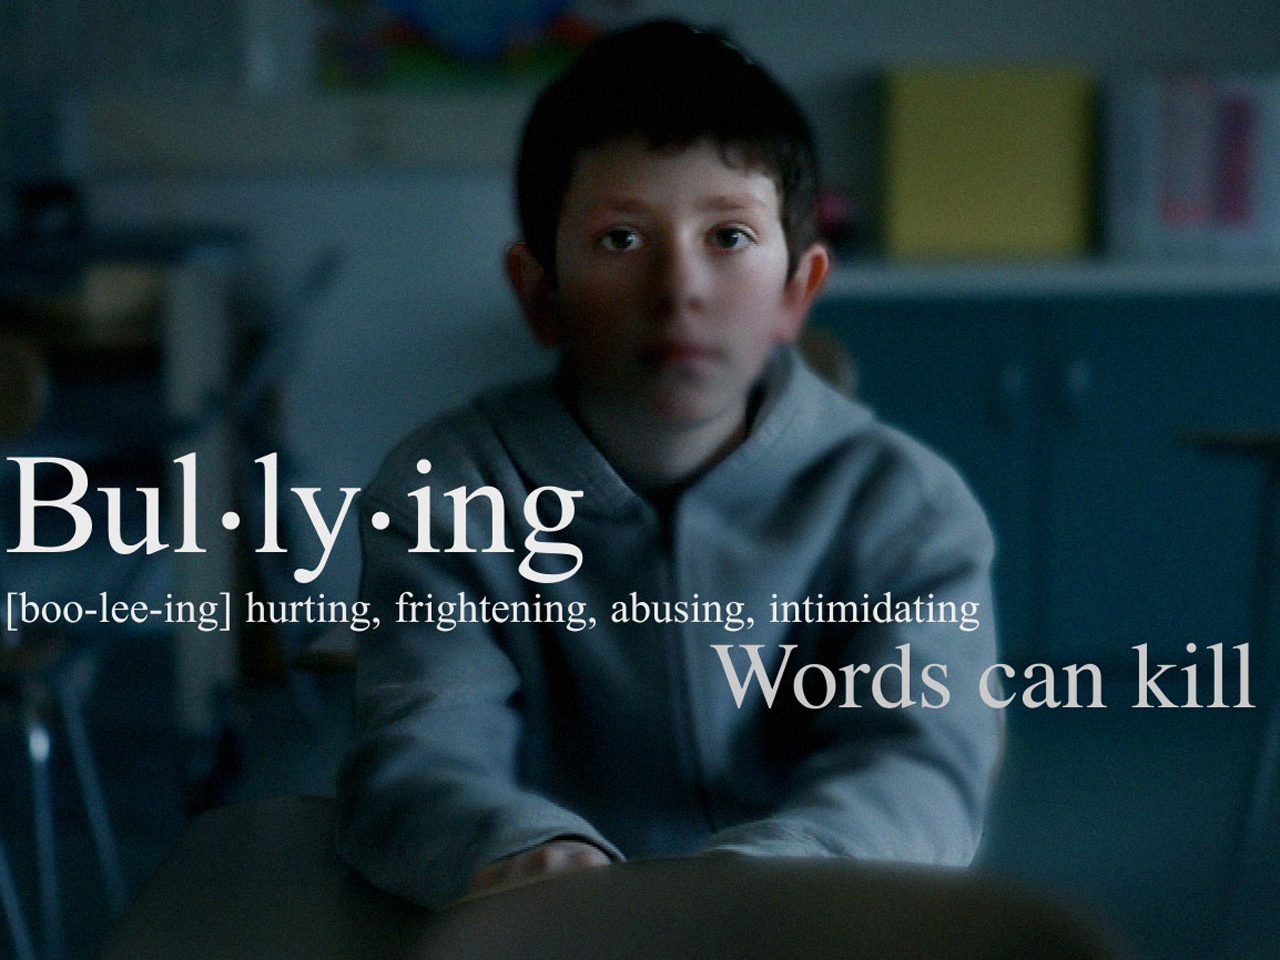 bullying words can kill cbs news